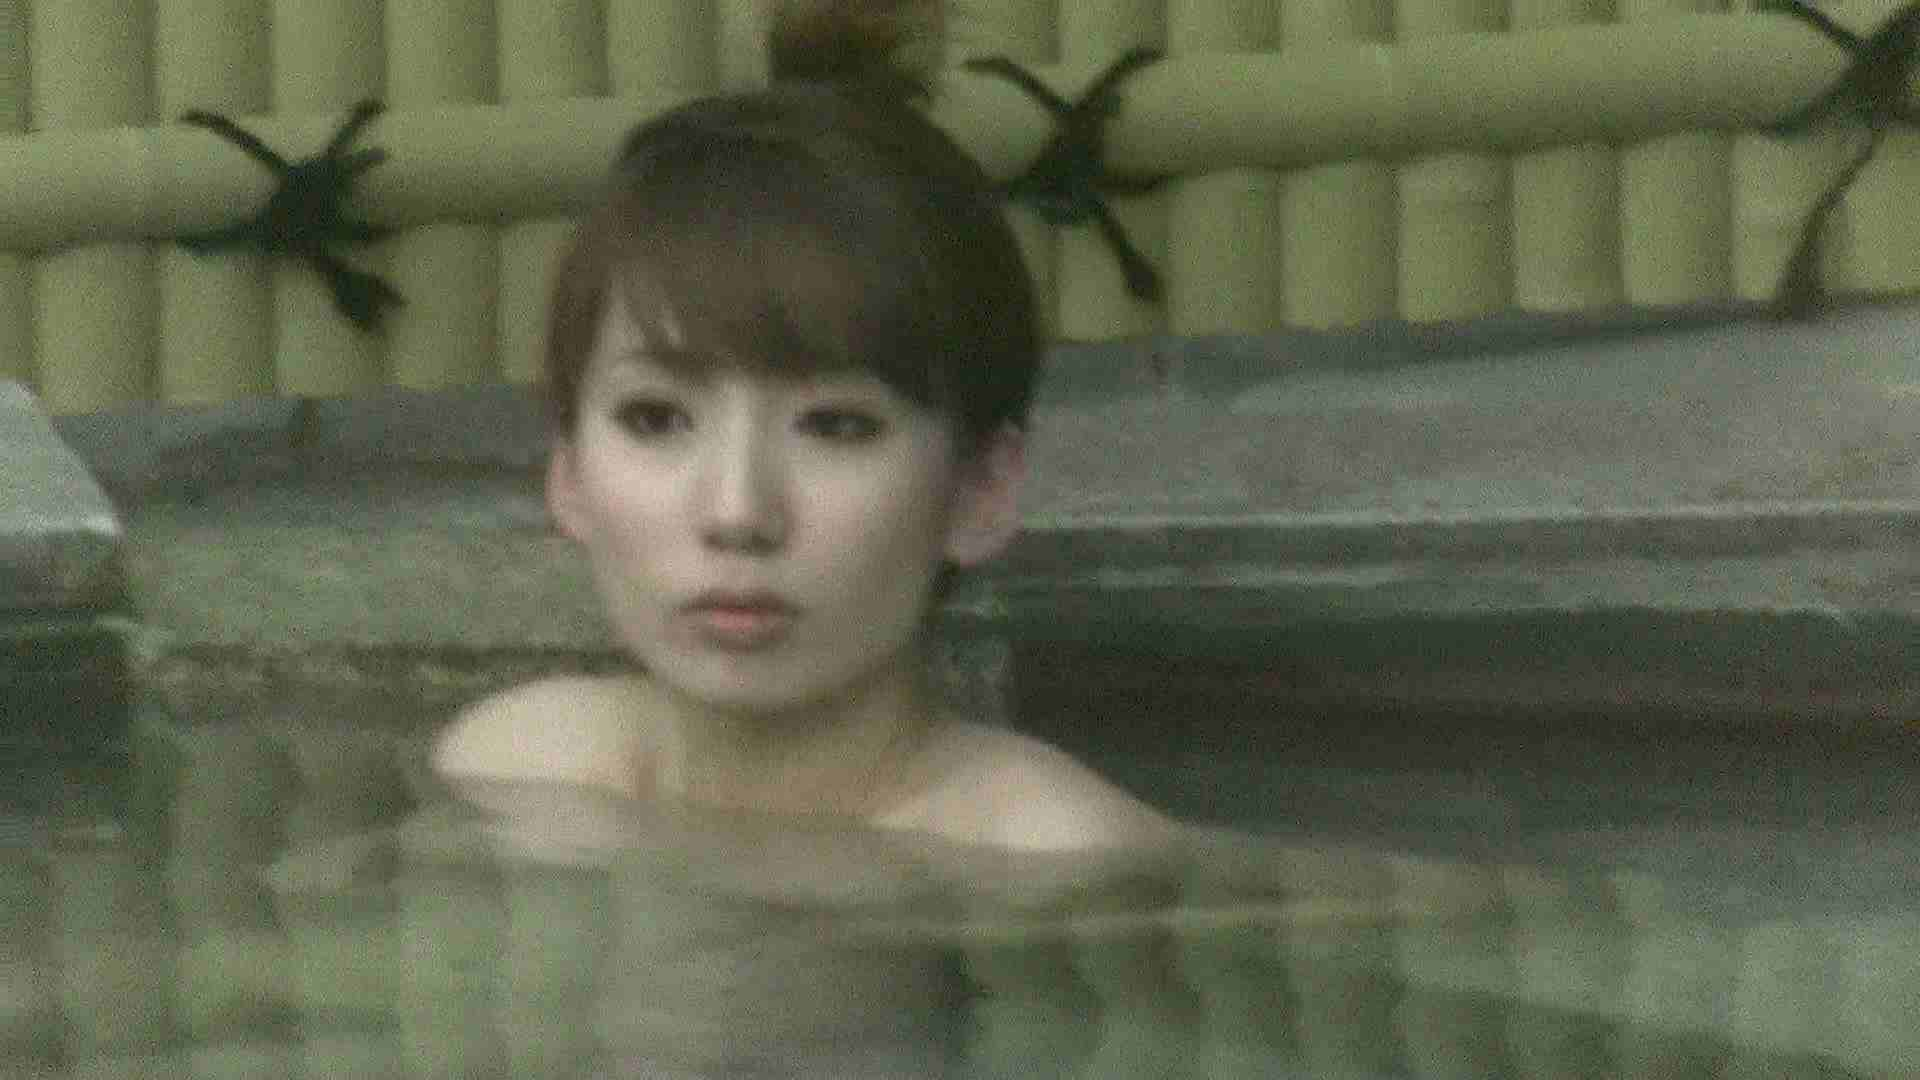 Aquaな露天風呂Vol.208 HなOL   盗撮  101pic 37